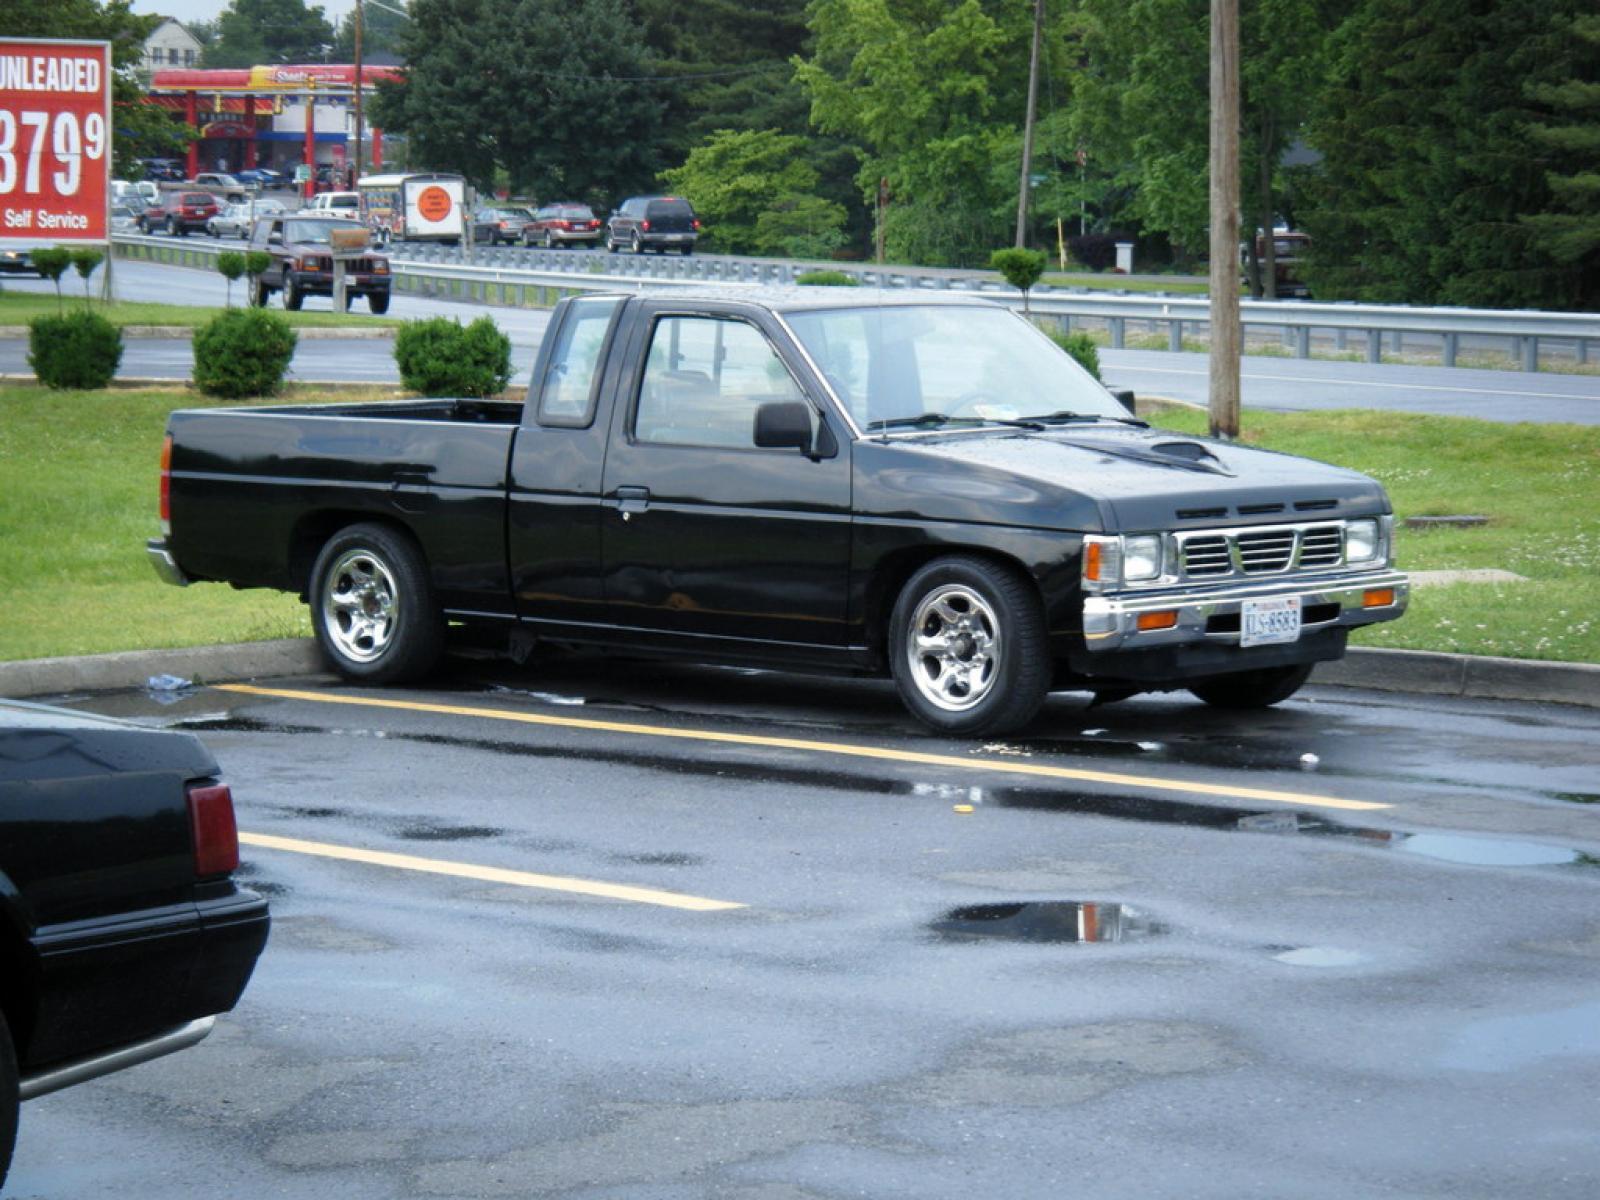 800 1024 1280 1600 Origin 1991 Nissan Truck